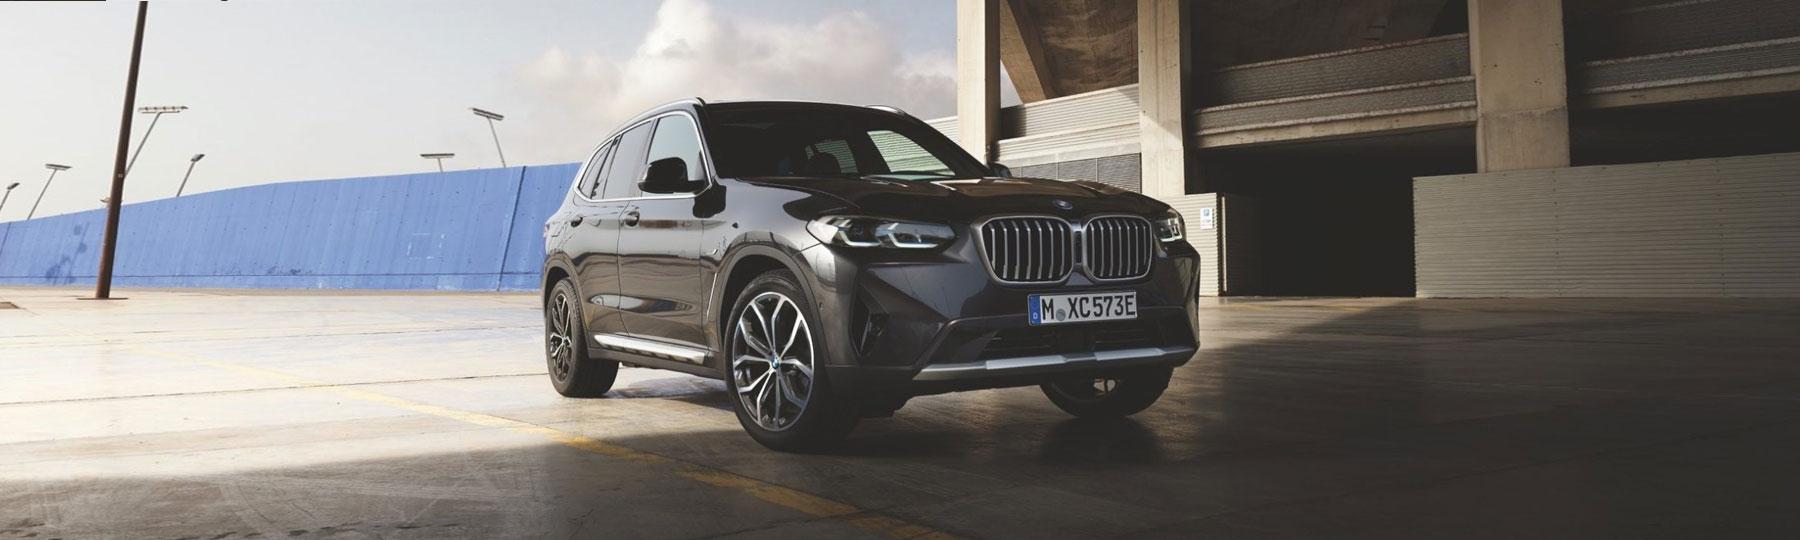 BMW X3 New Car Offer